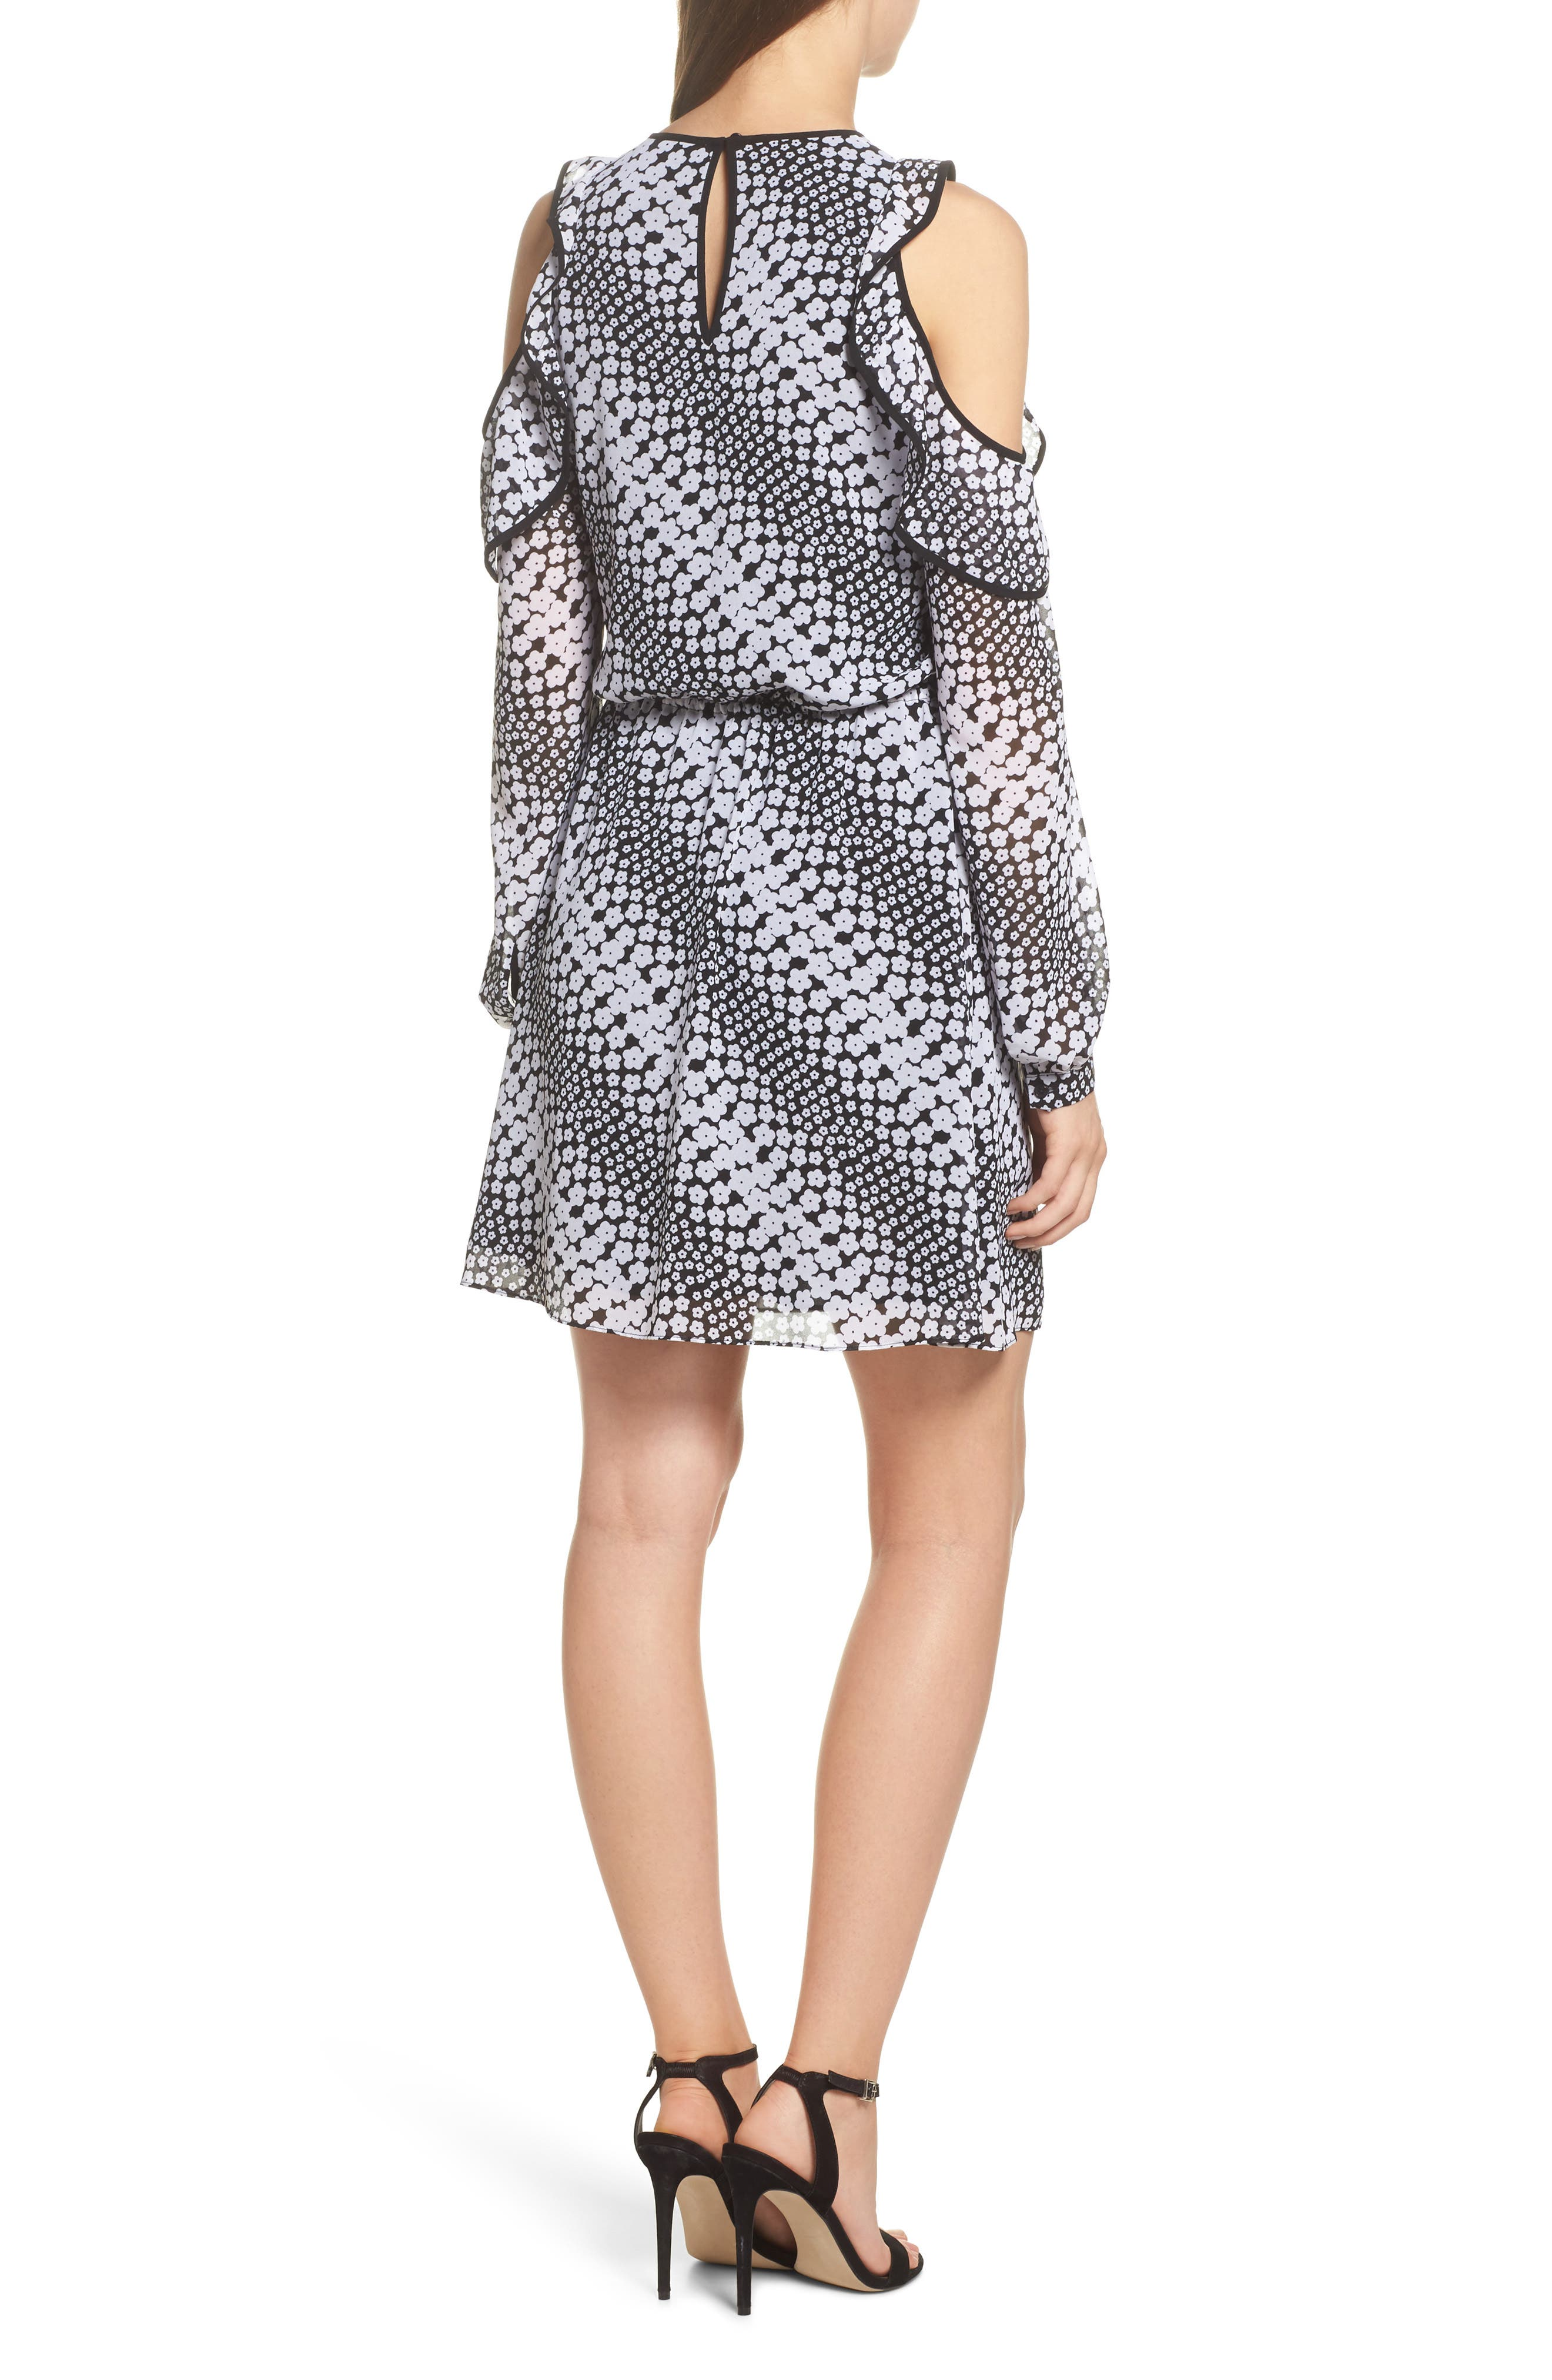 Cold Shoulder Blouson Dress,                             Alternate thumbnail 2, color,                             Black/ White